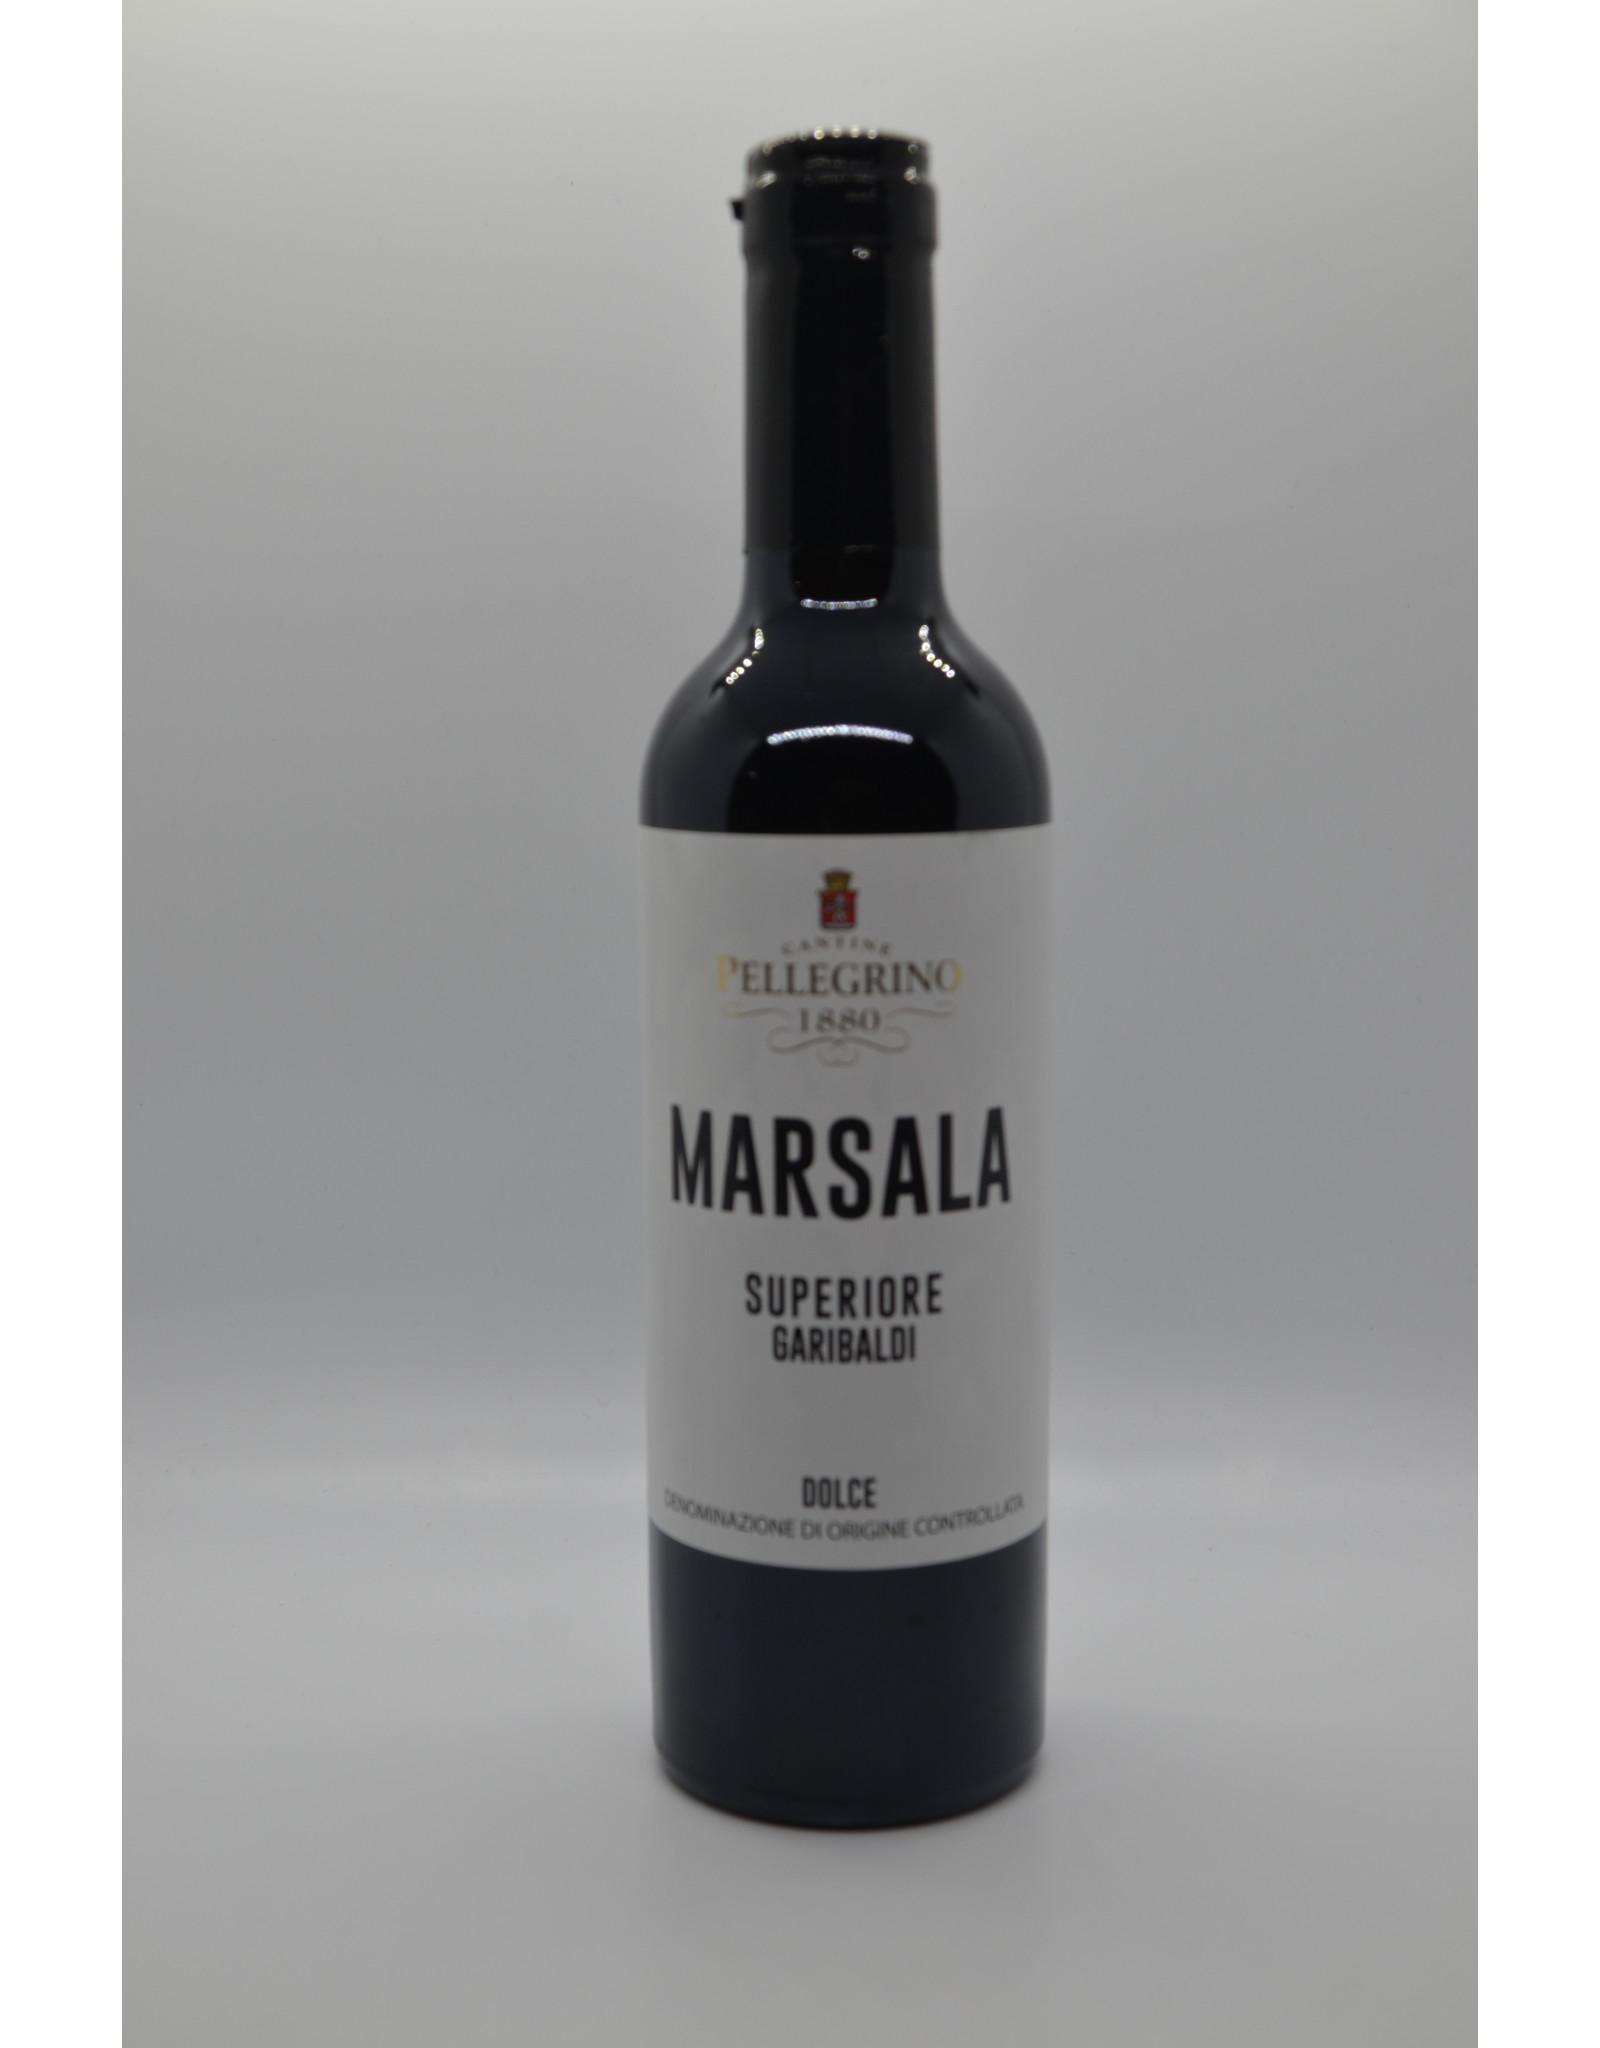 Italy Pellegrino Marsala Superiore 375ml